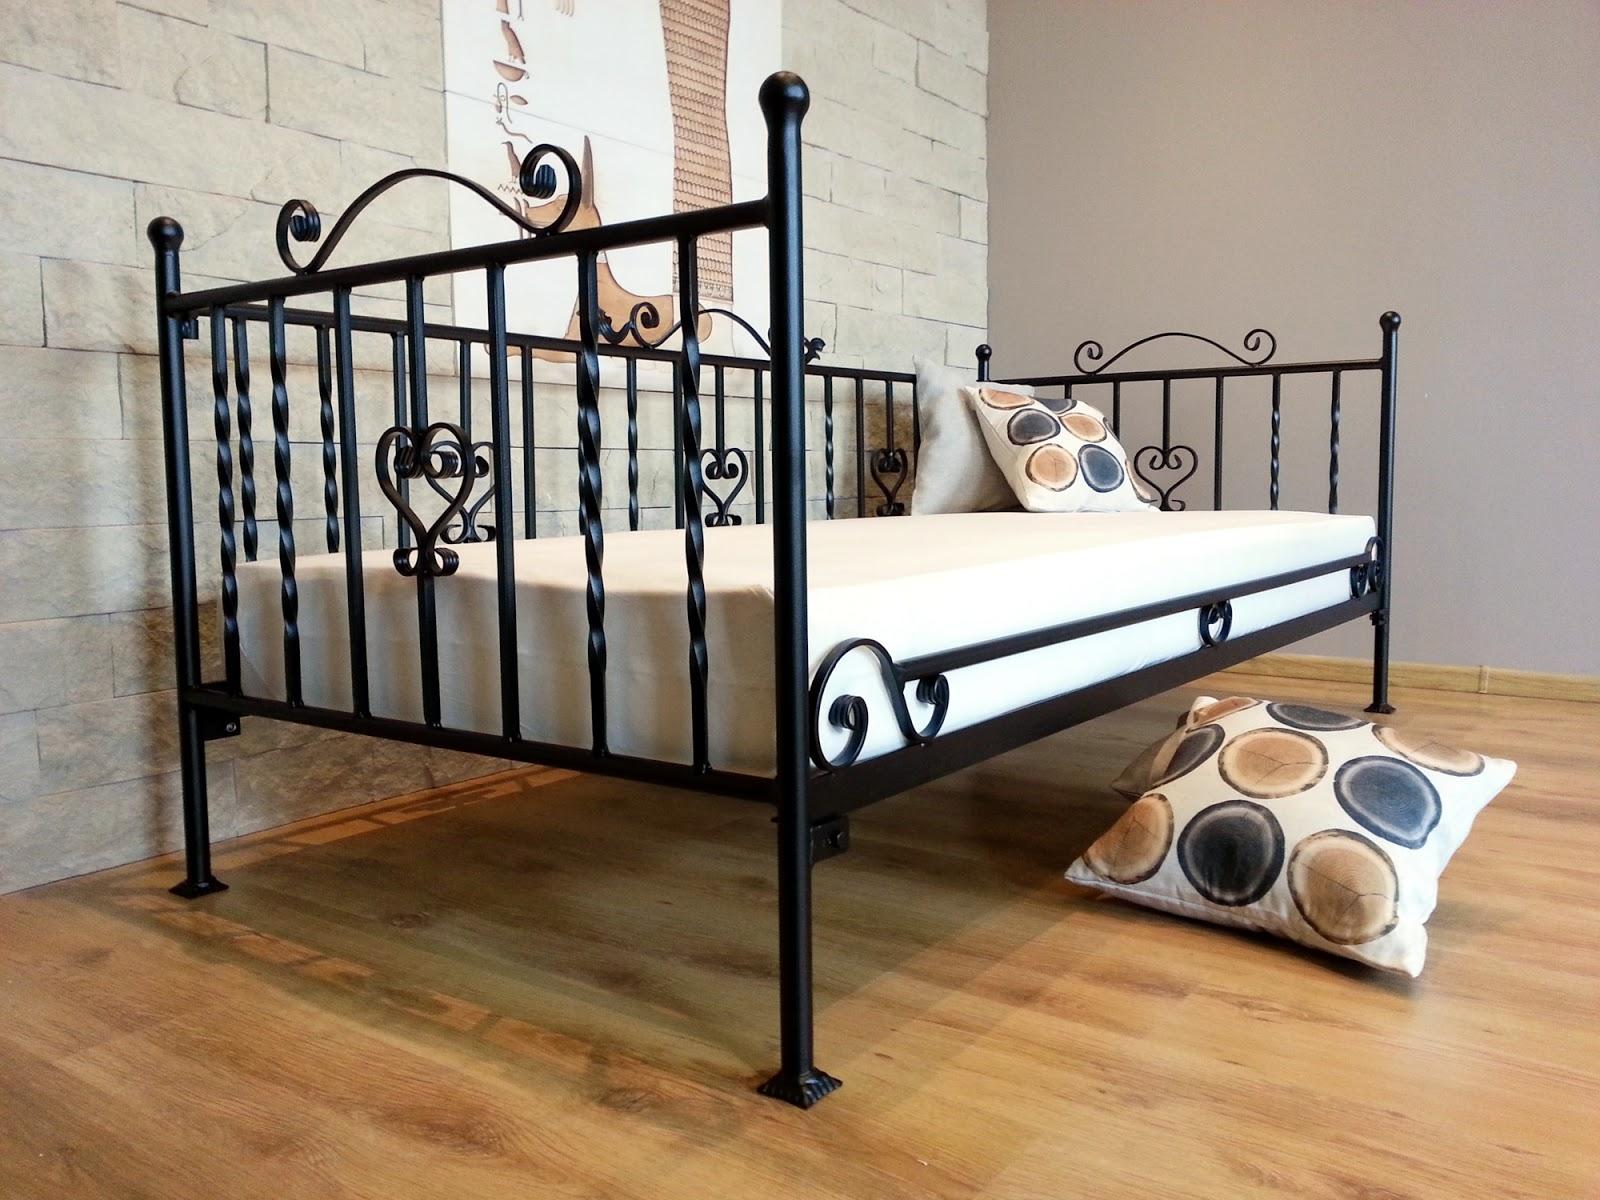 Łóżko metalowe sofa wzór 4S